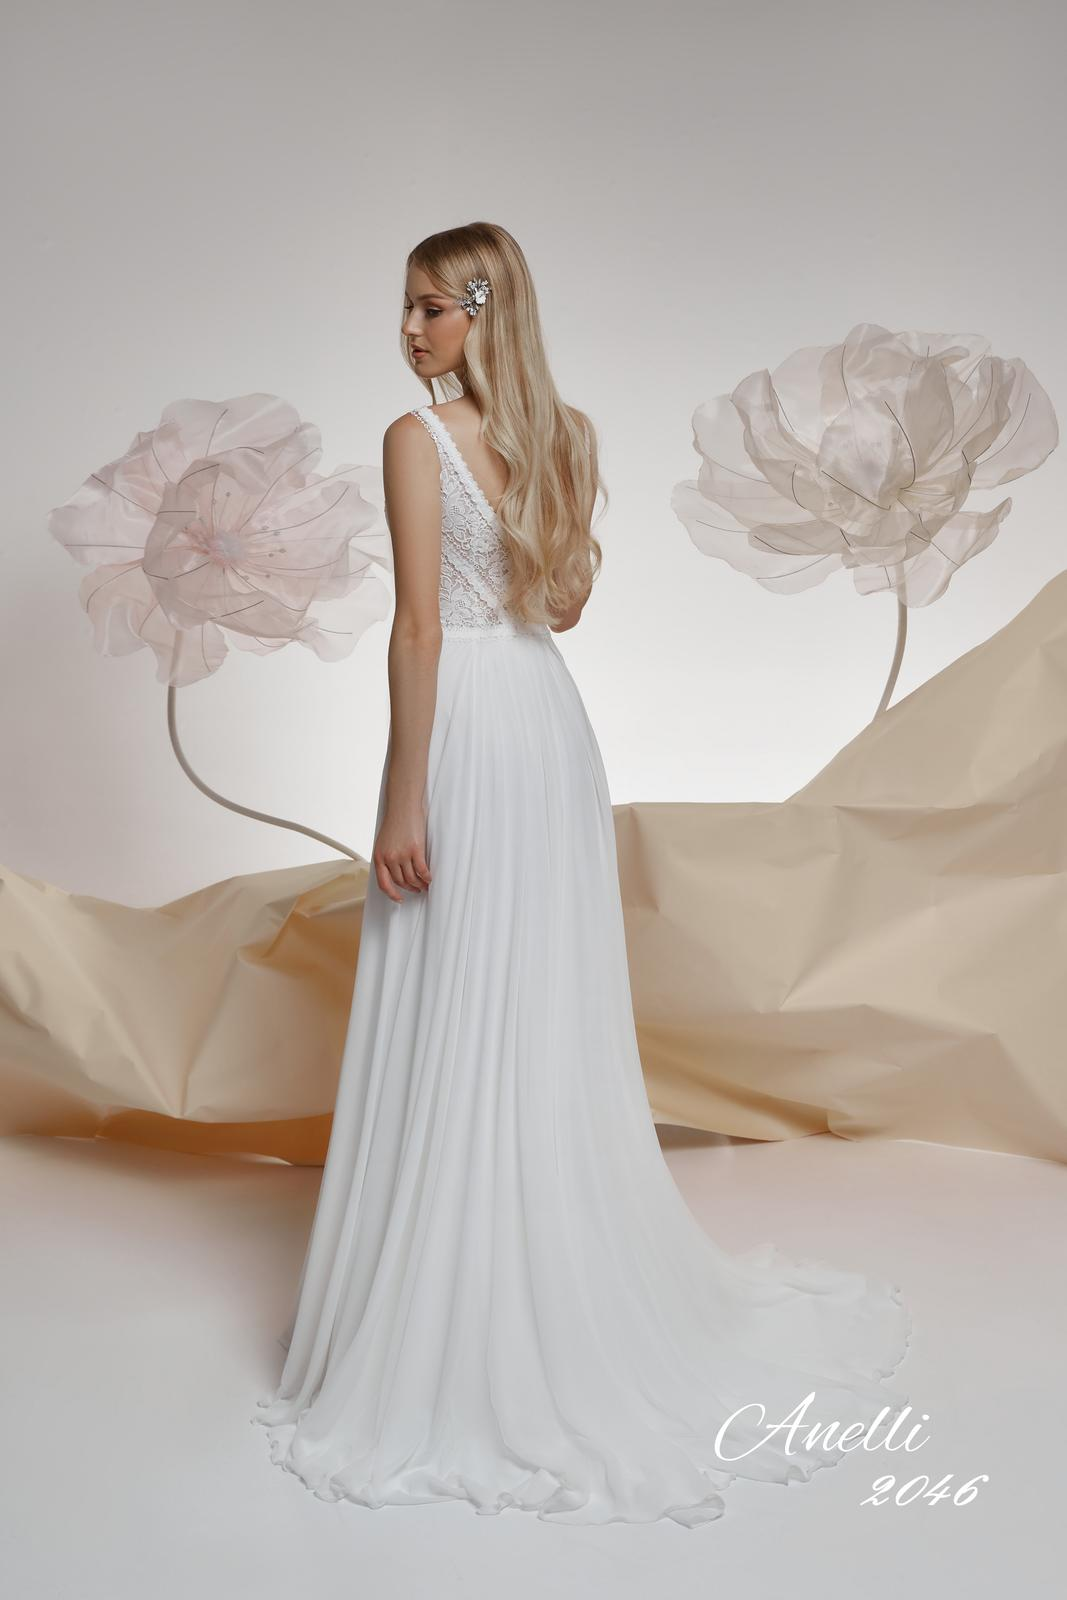 Svadobné šaty - Imagine 2046 - Obrázok č. 3